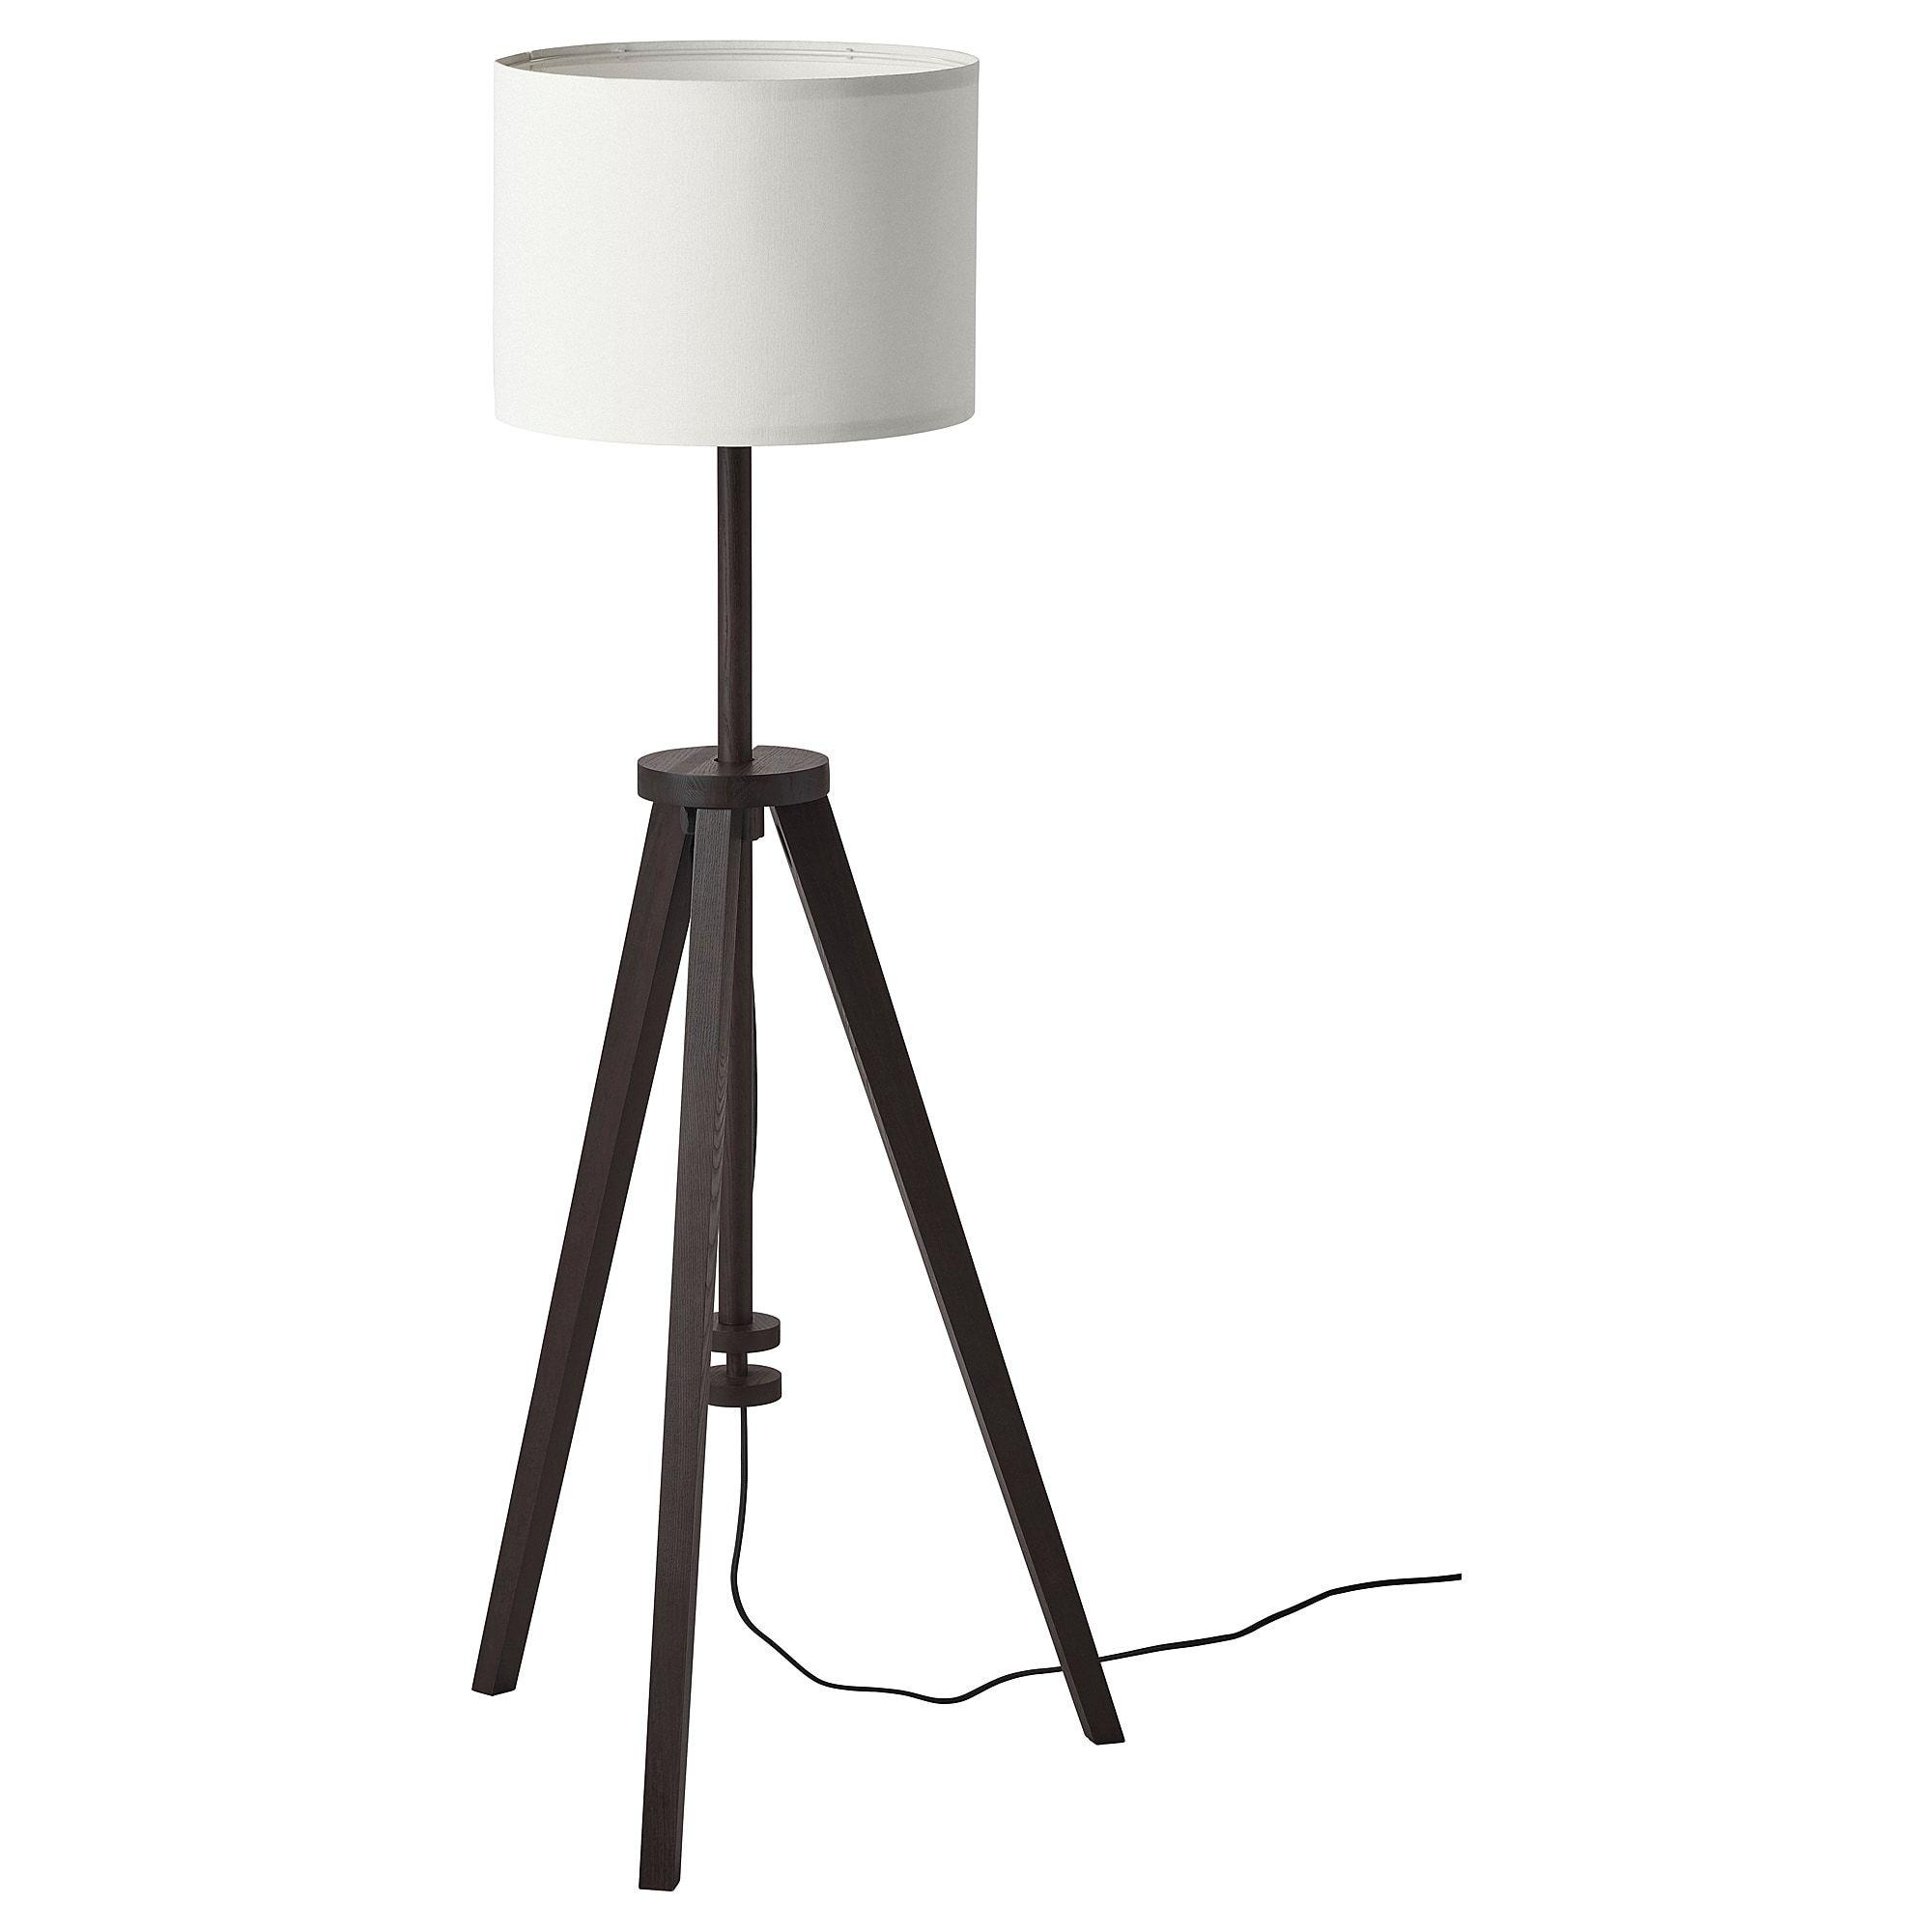 Lauters Floor Lamp Brown Ash White Floor Lamp Lamp White Floor Lamp